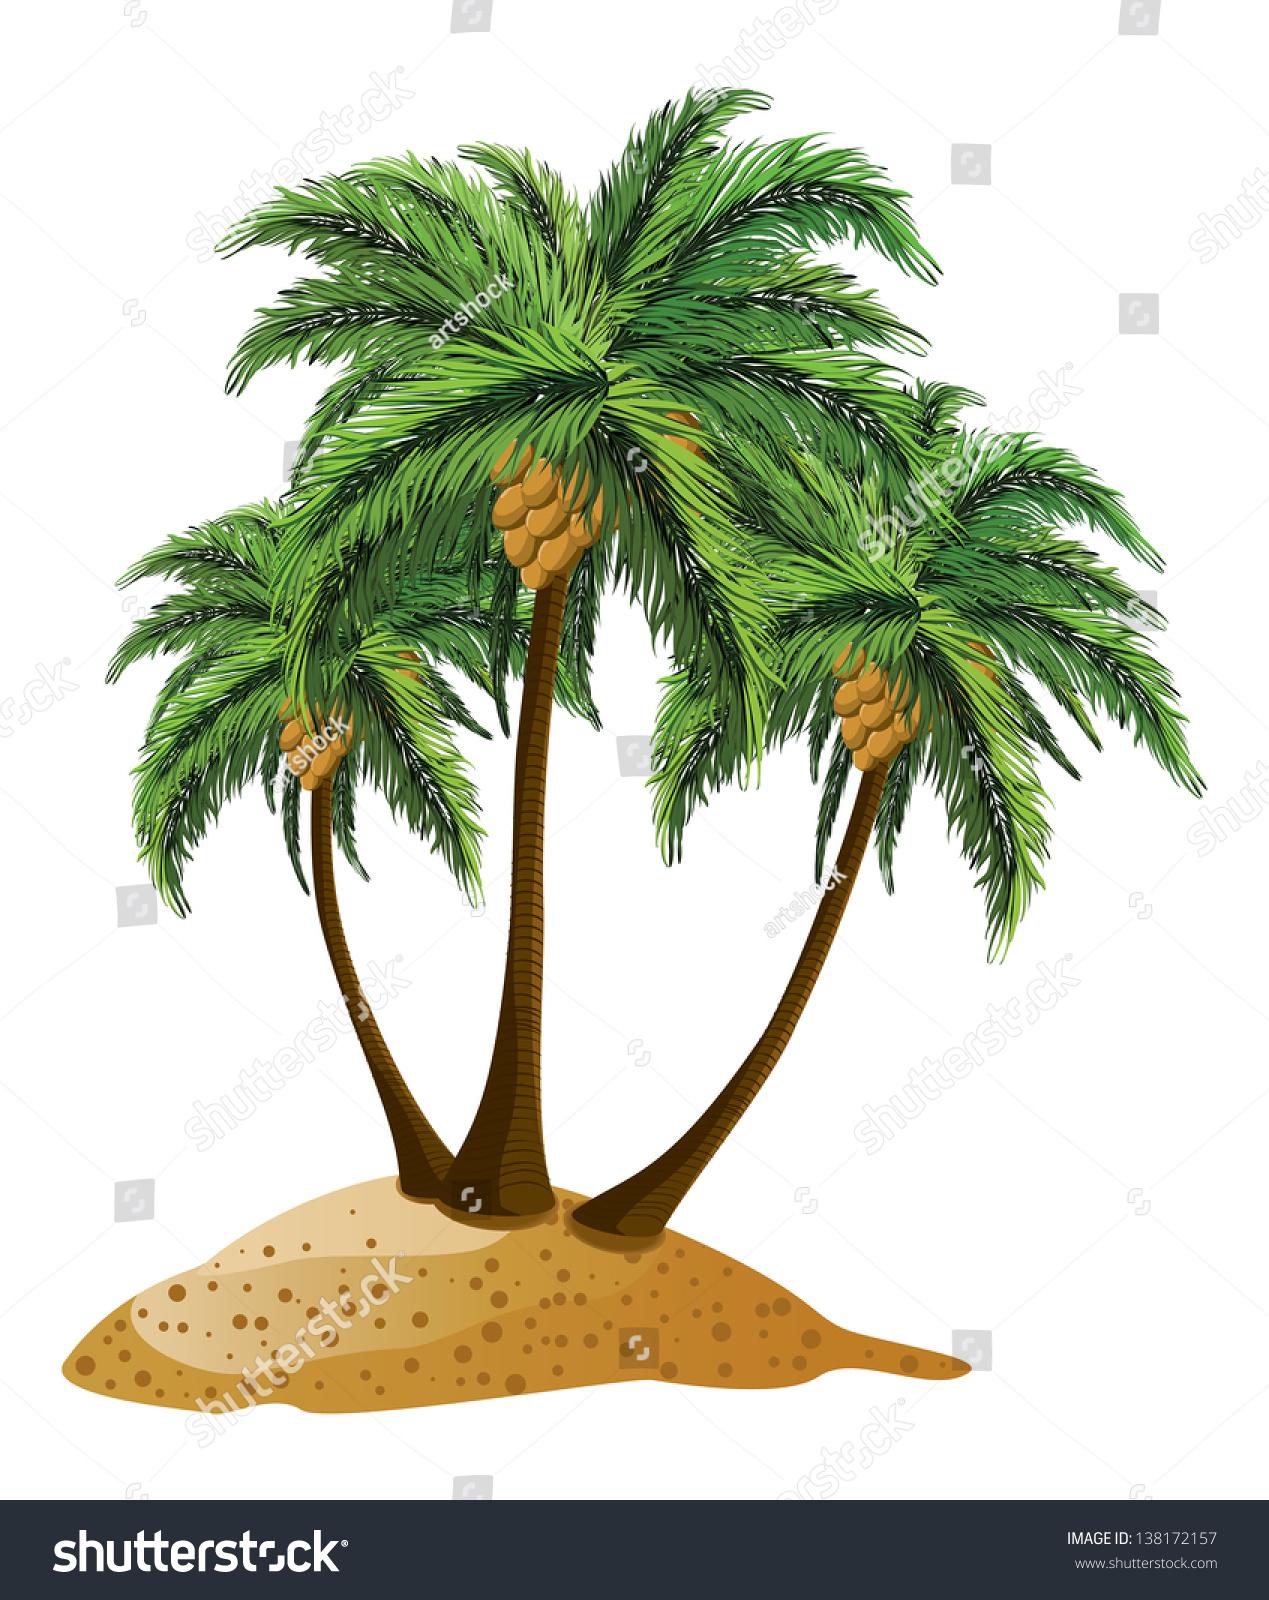 small cartoon island three palm trees stock vector 138172157 shutterstock. Black Bedroom Furniture Sets. Home Design Ideas